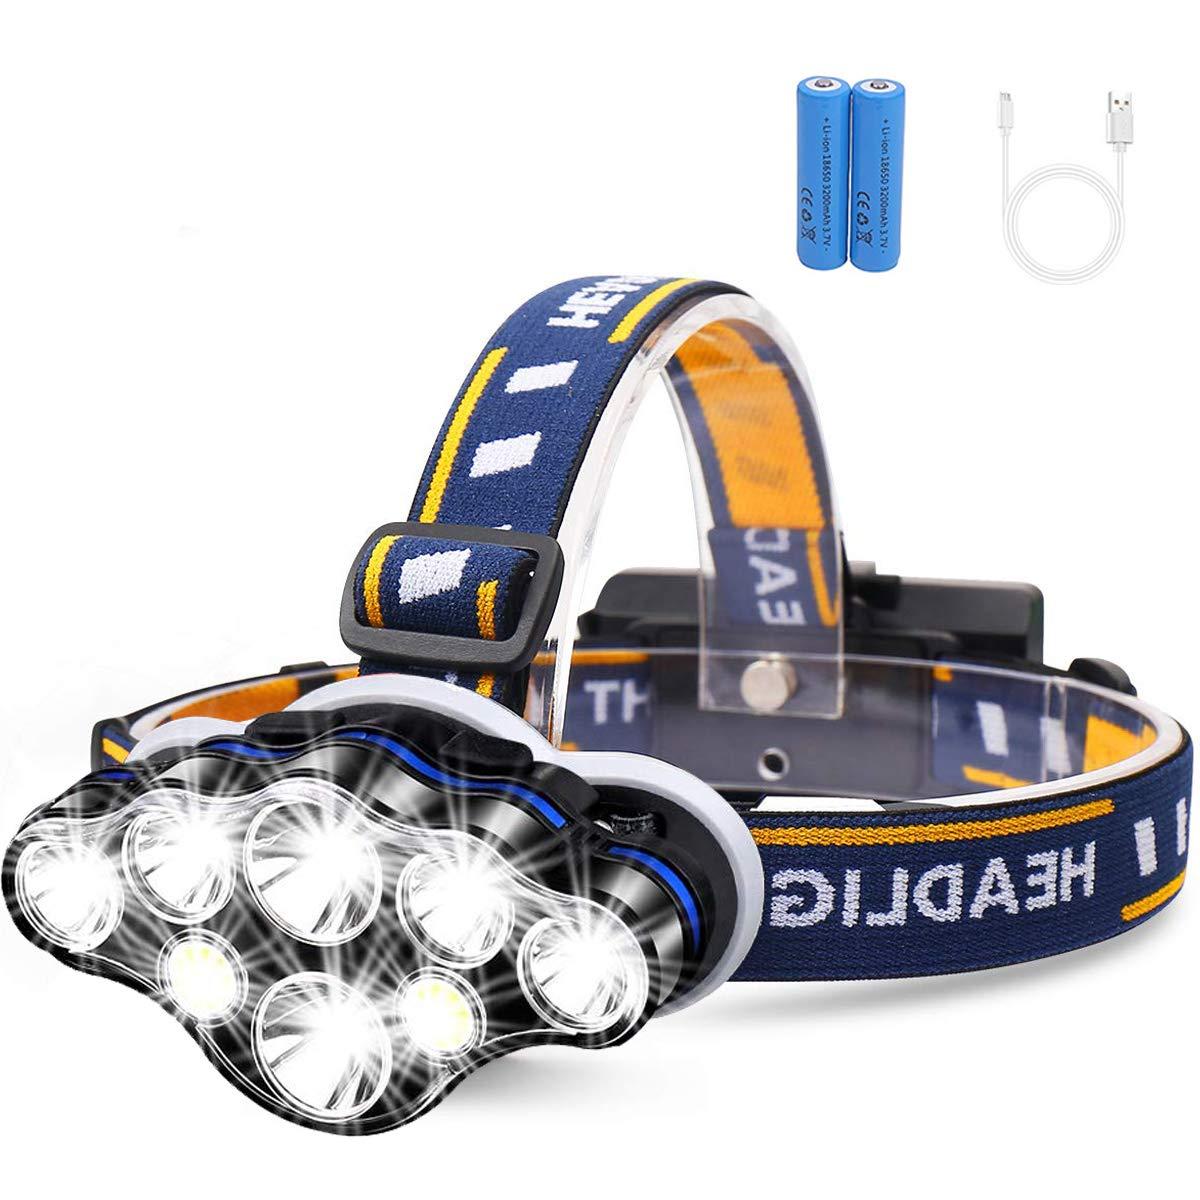 GM10201 8LED USB Rechargeable Waterproof Headlamp